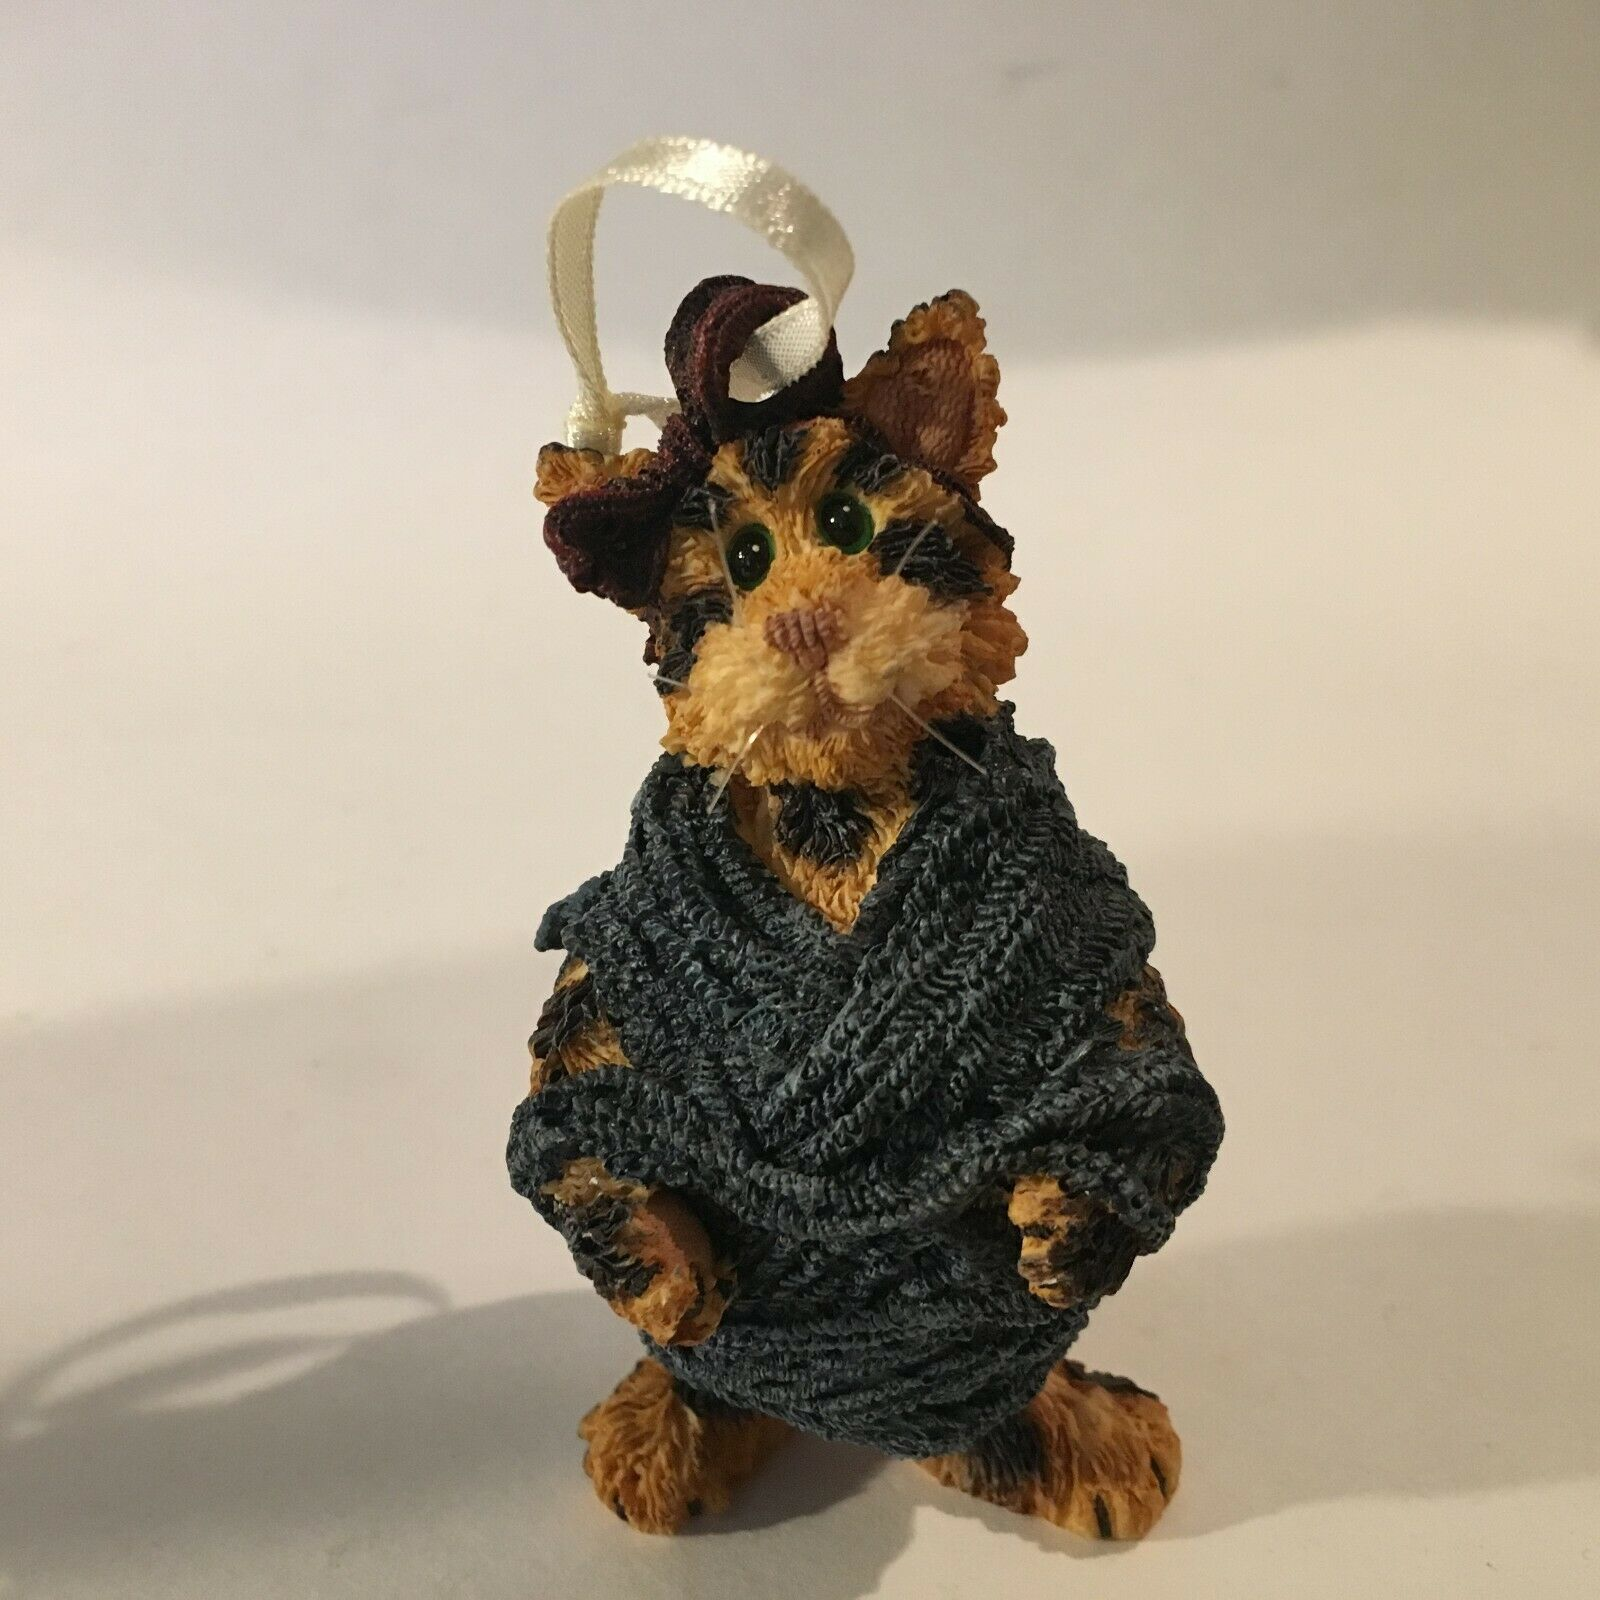 "Boyd's Bears & Friends Resin Figurine Blue Outfit Resin Yarn 3.5"" X 2"""